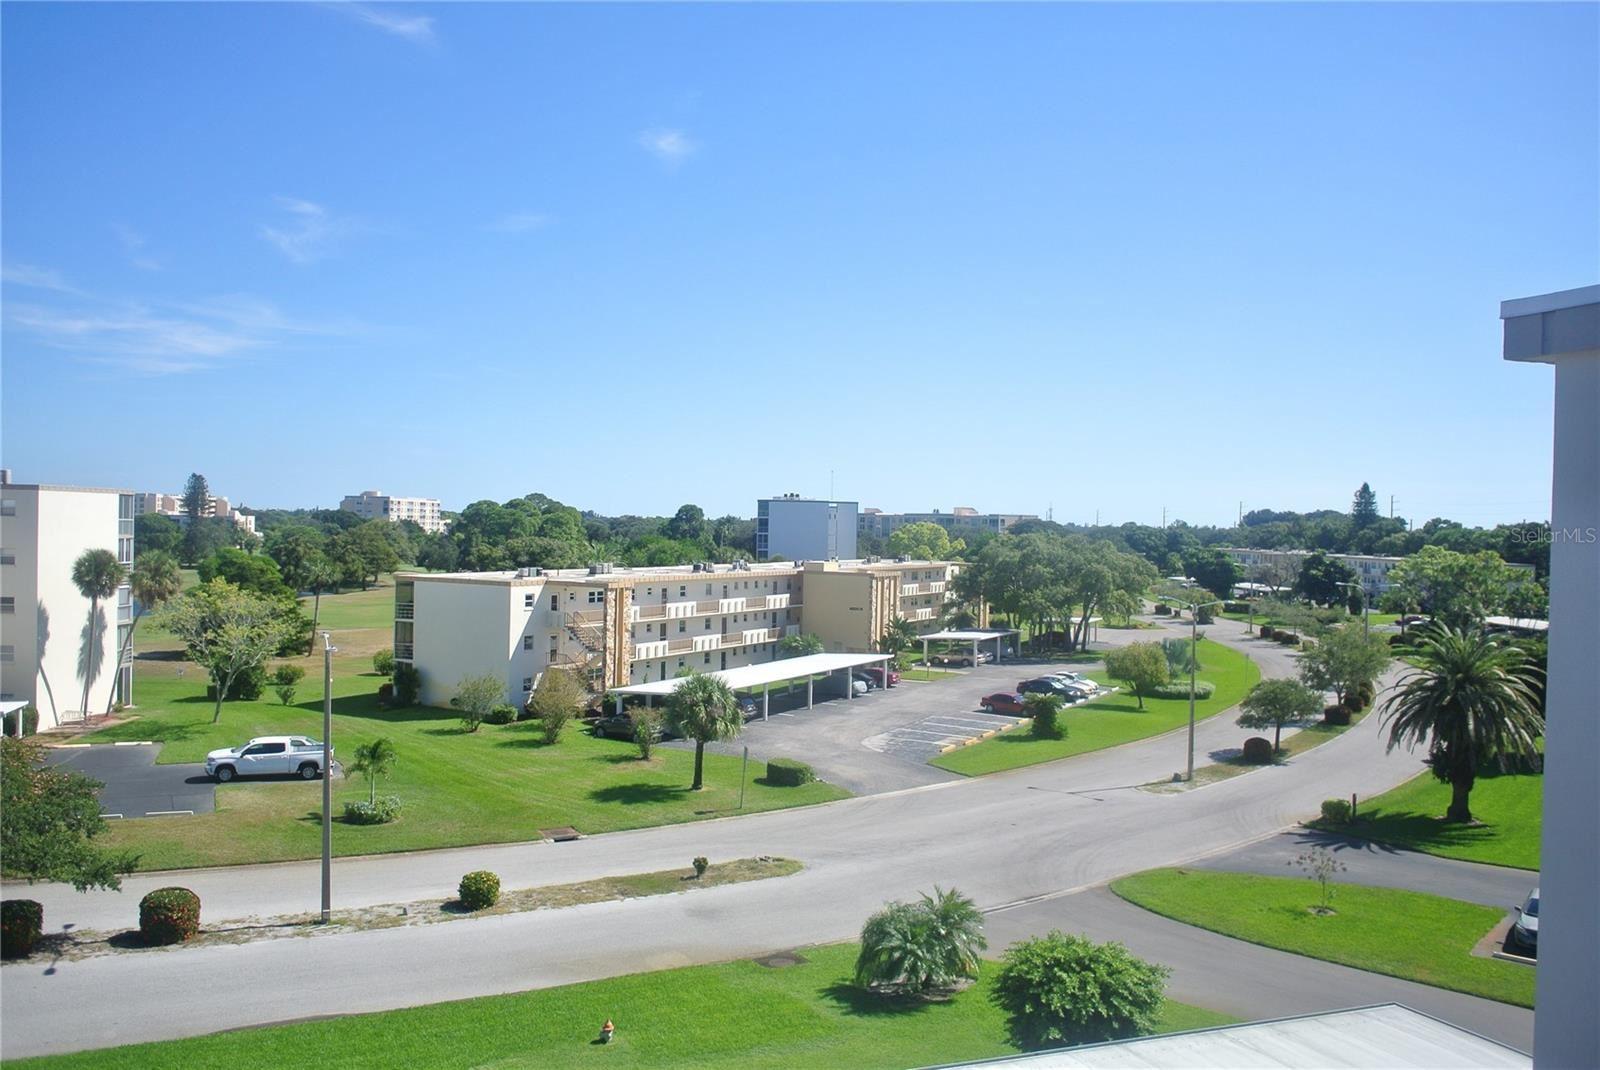 Photo of 4210 IRONWOOD CIRCLE #503J, BRADENTON, FL 34209 (MLS # A4515470)